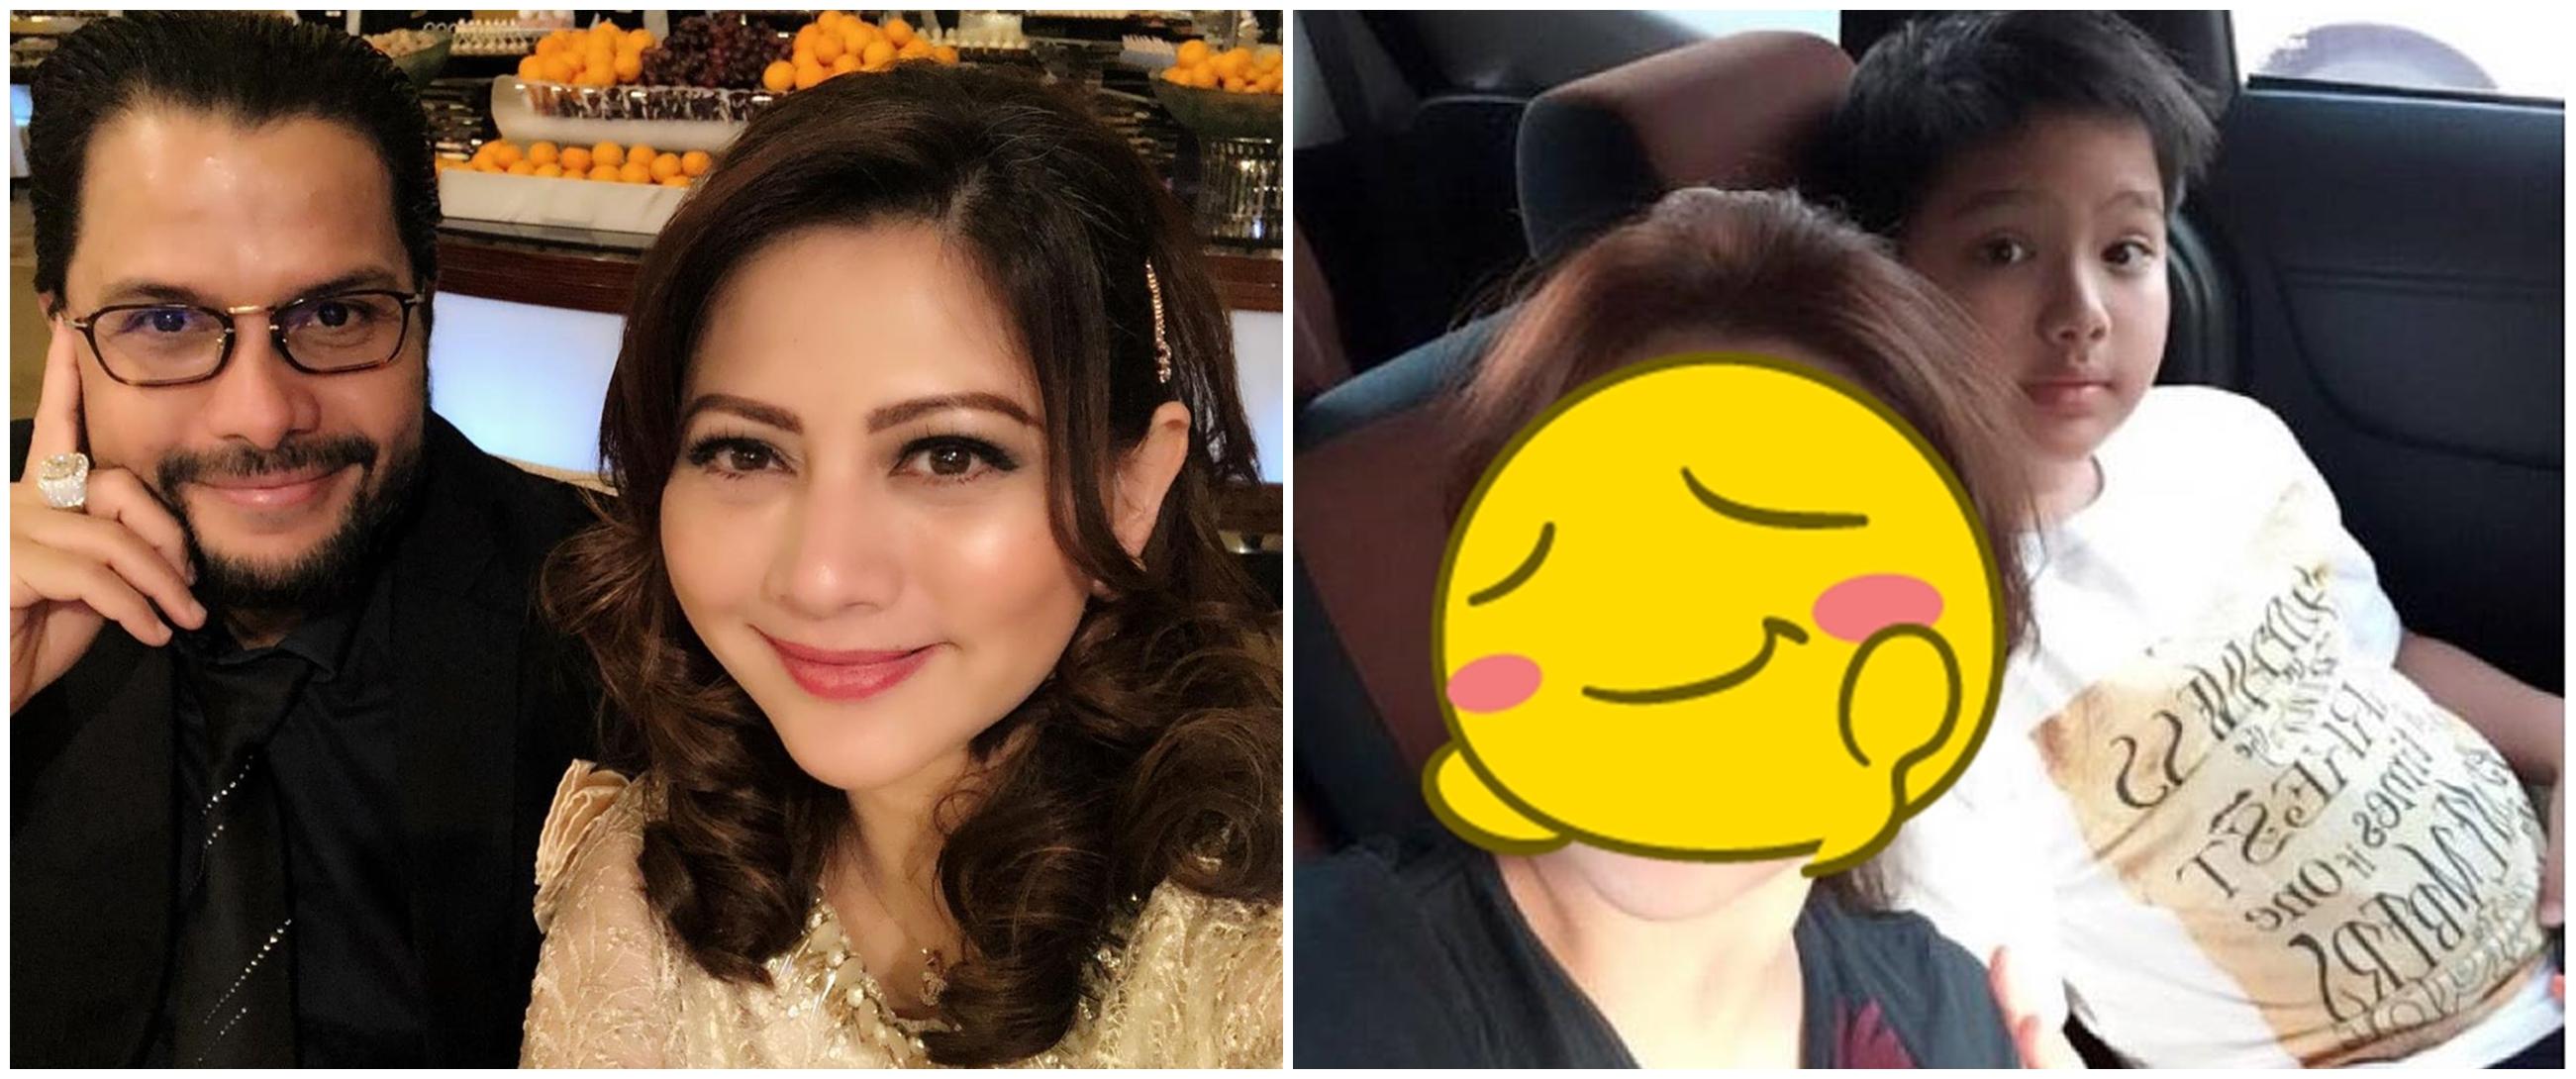 Potret 6 aktris sinetron usia 40-an saat pakai vs tanpa makeup